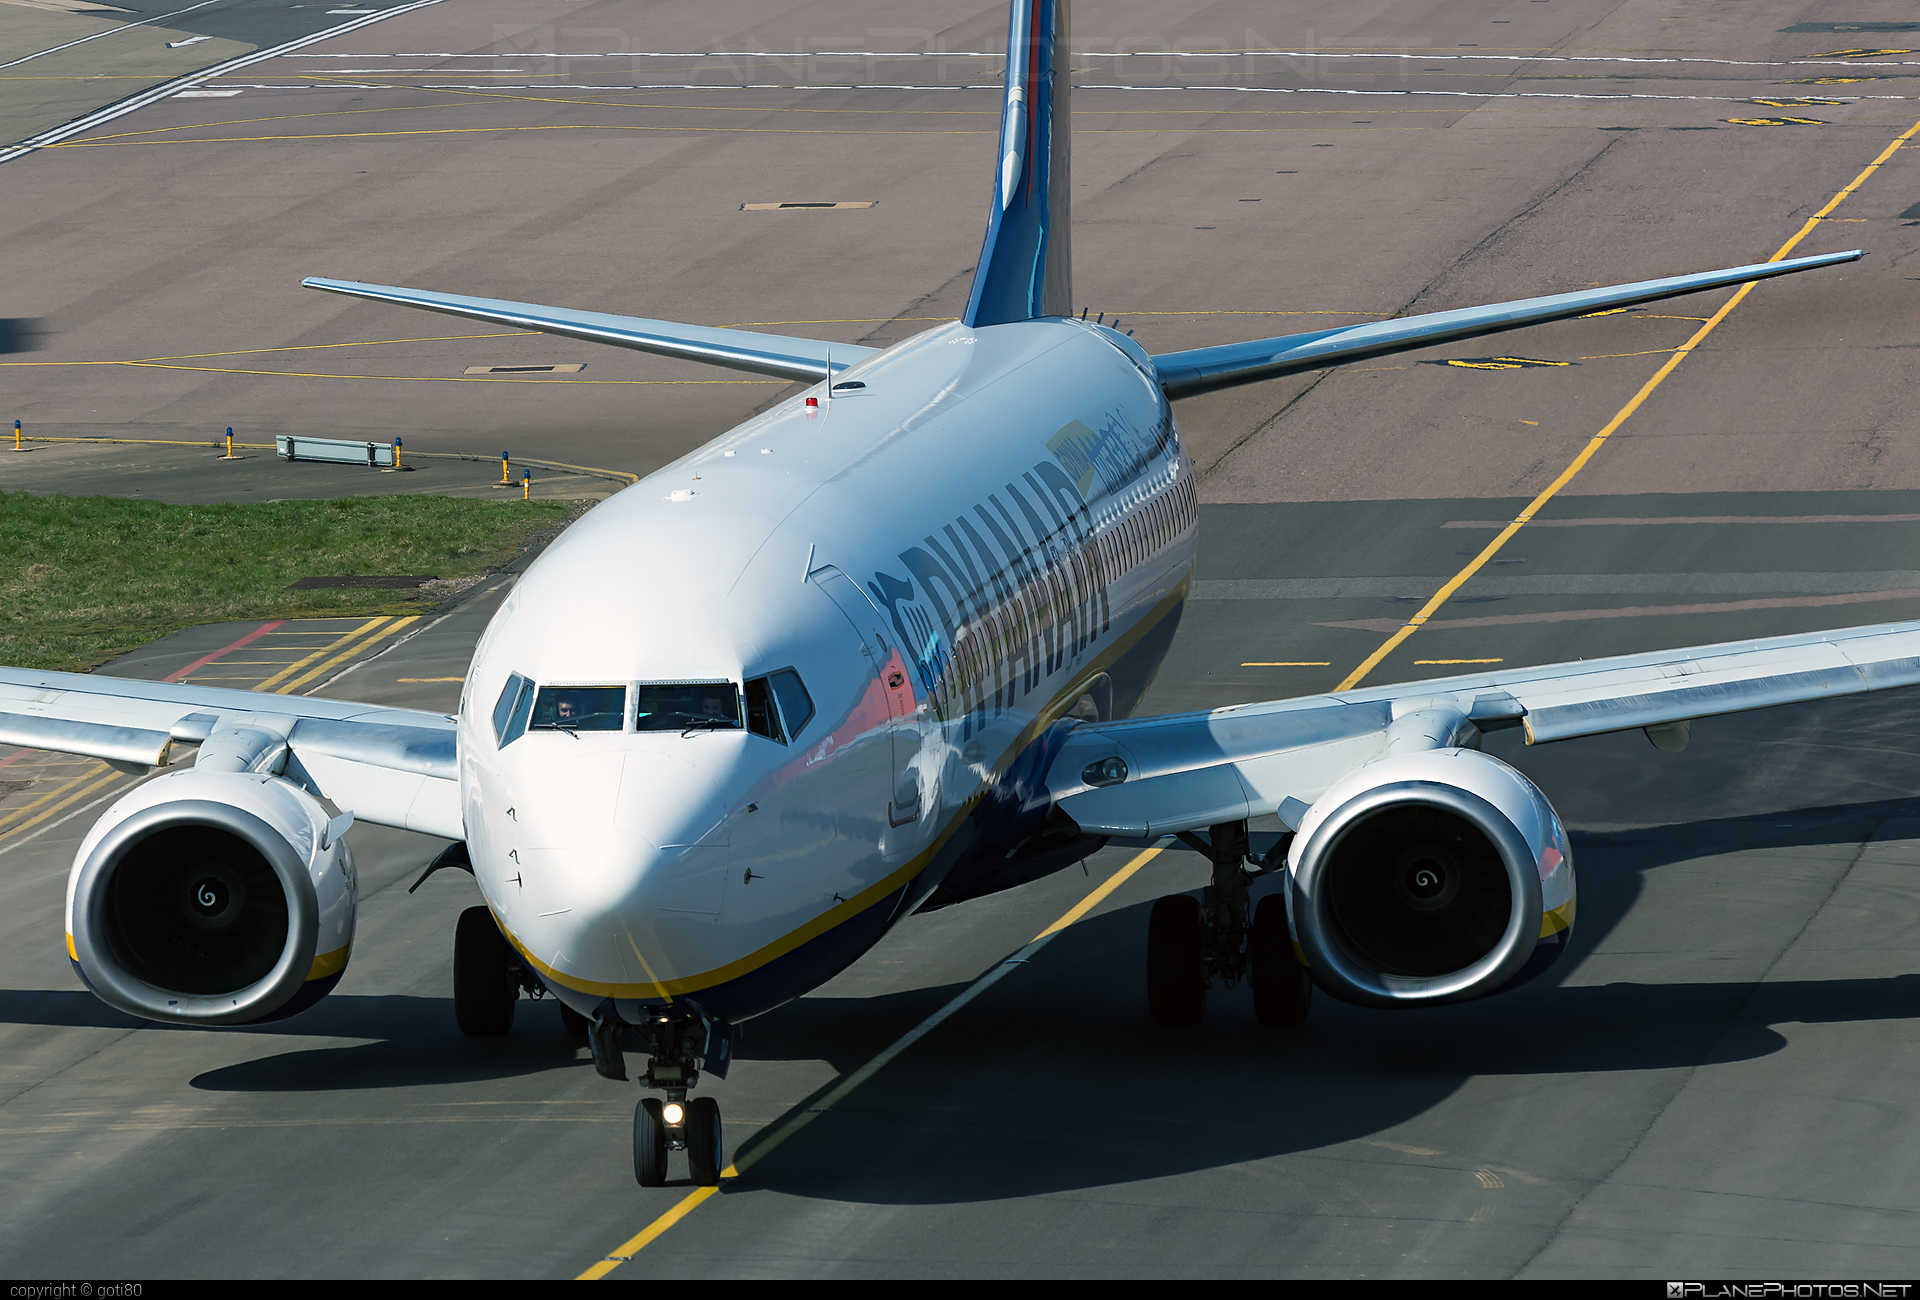 Boeing 737-800 - EI-DAP operated by Ryanair #b737 #b737nextgen #b737ng #boeing #boeing737 #ryanair